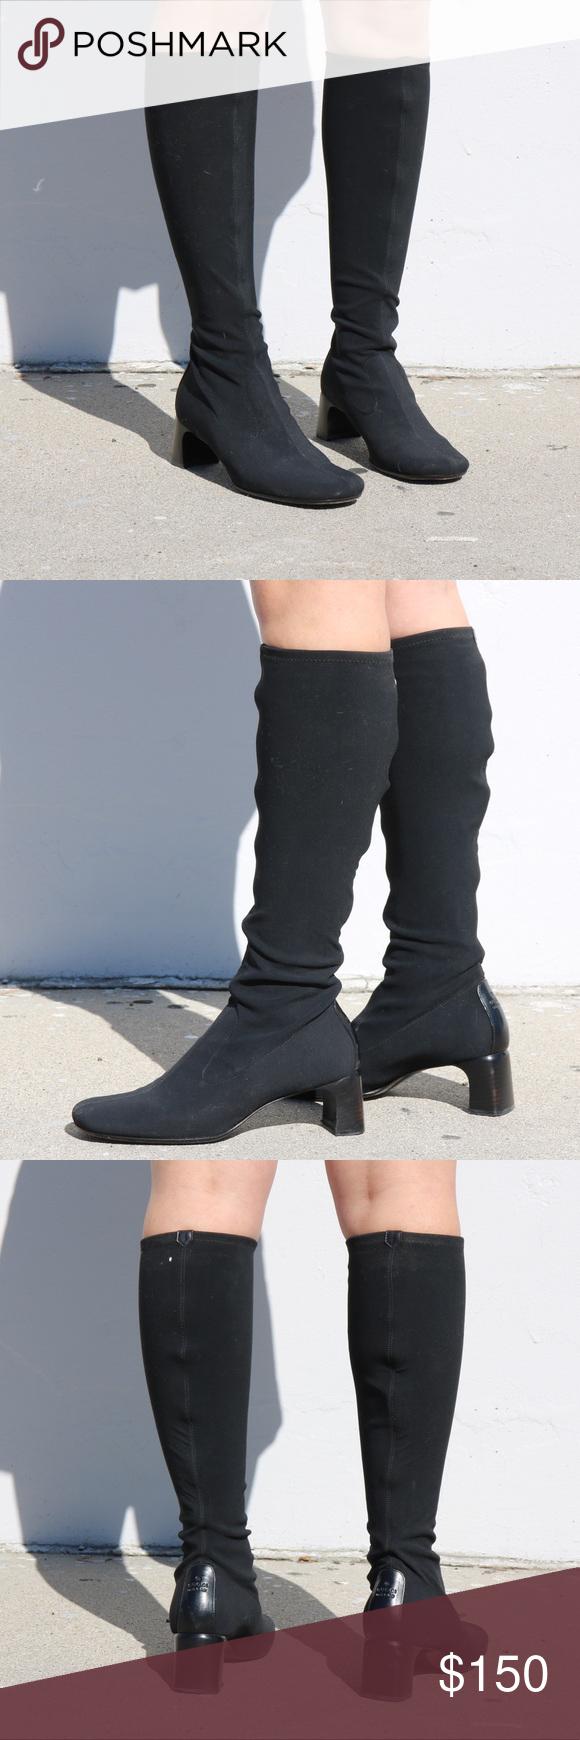 0d2dce7dad7 GUCCI SZ 7.5 SOCK BLACK BOOTS VINTAGE Super cute 90s Gucci boots Gucci Shoes